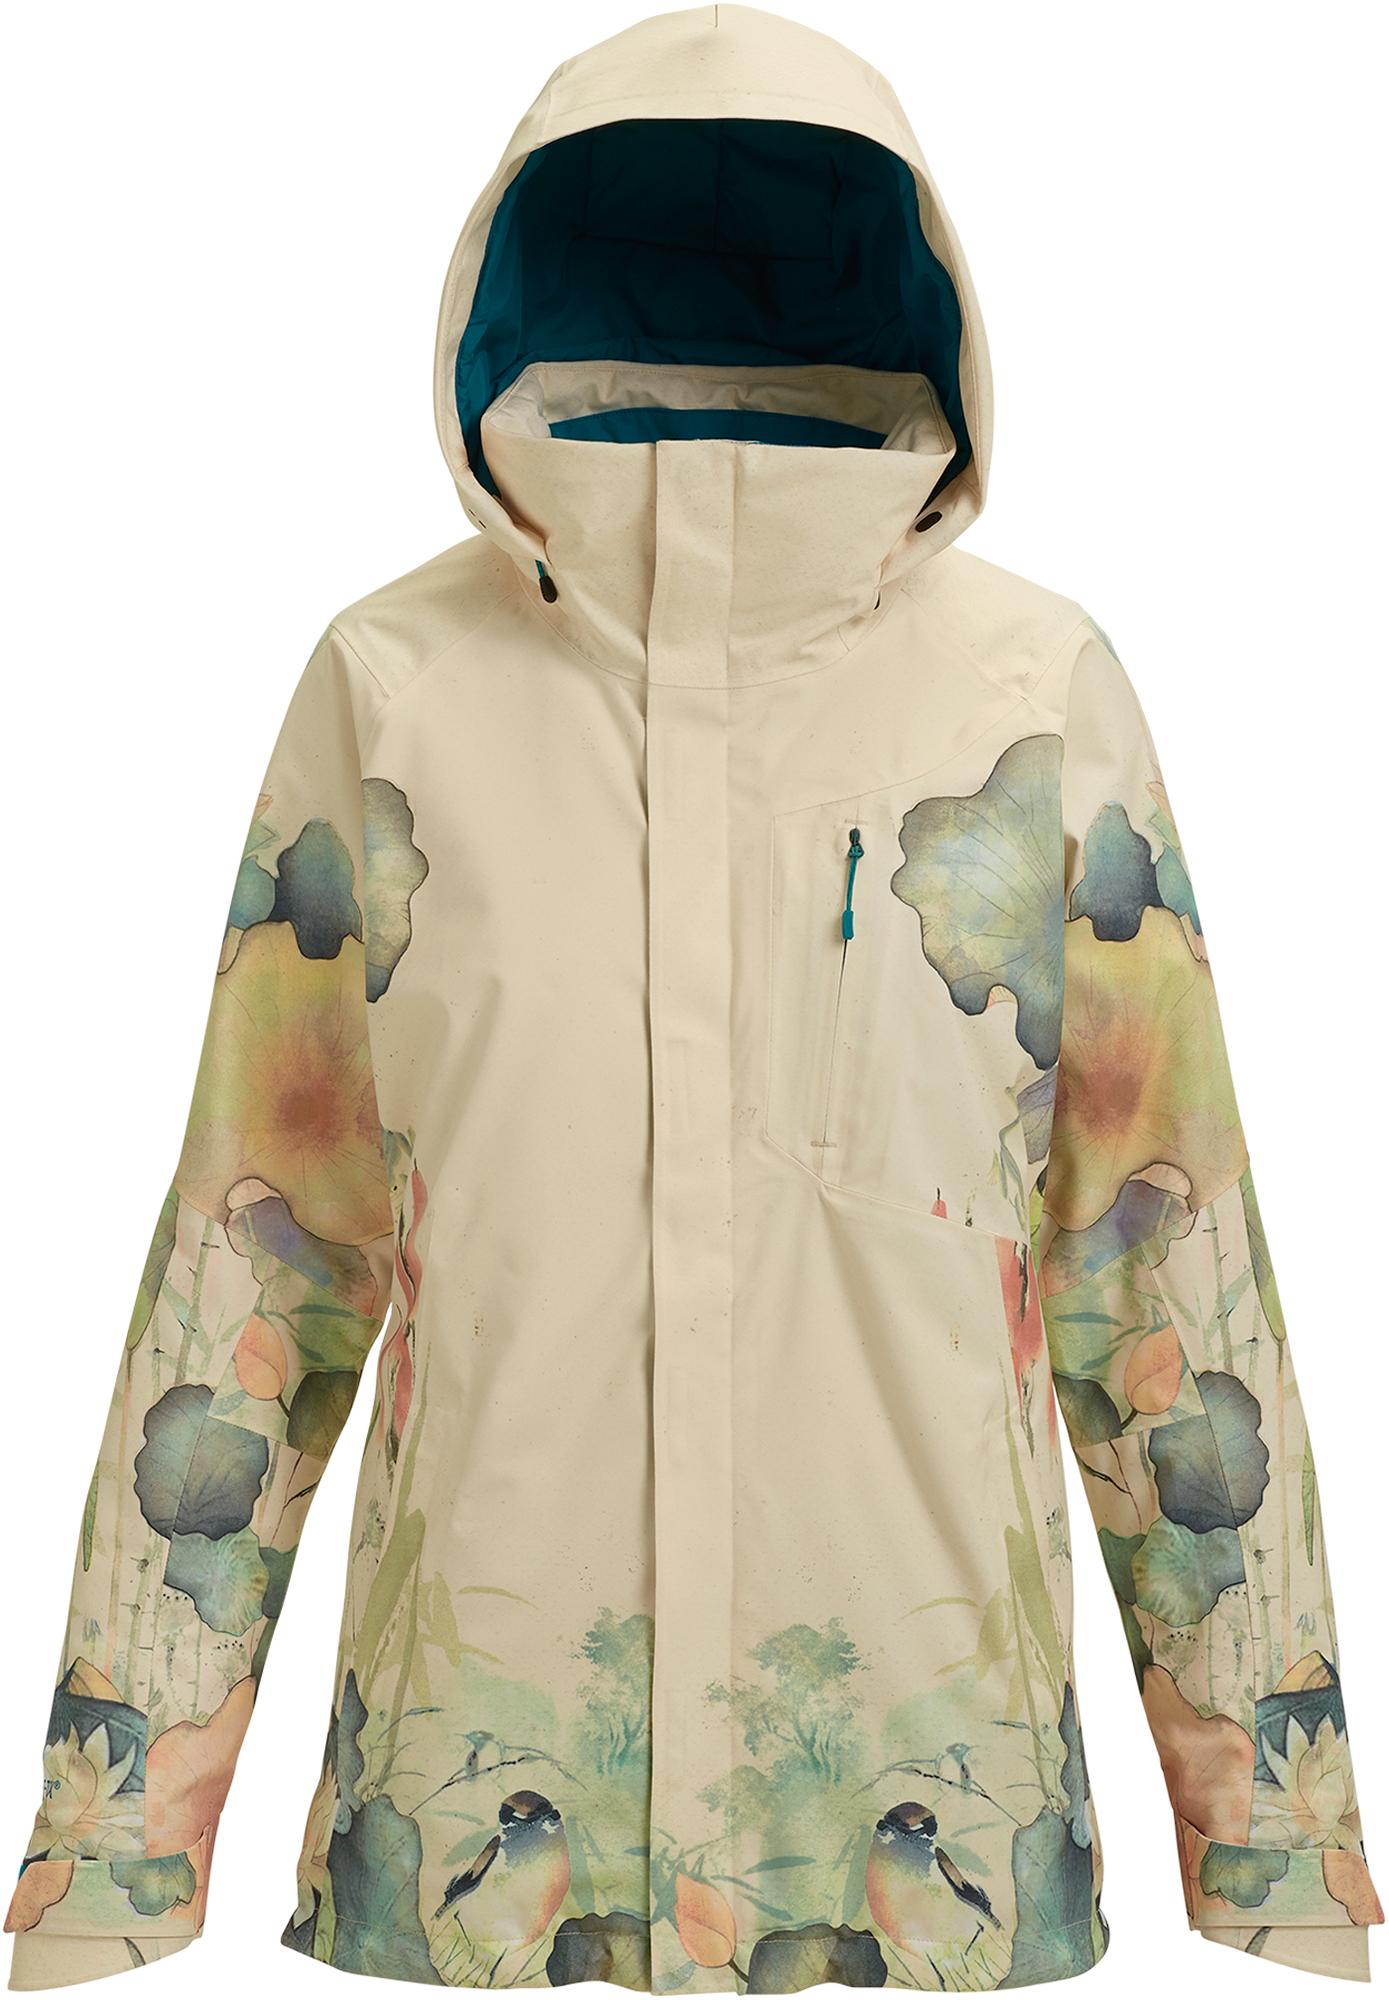 Burton Куртка утепленная женская Burton Ak Gore-Tex Embark, размер 46-48 цена